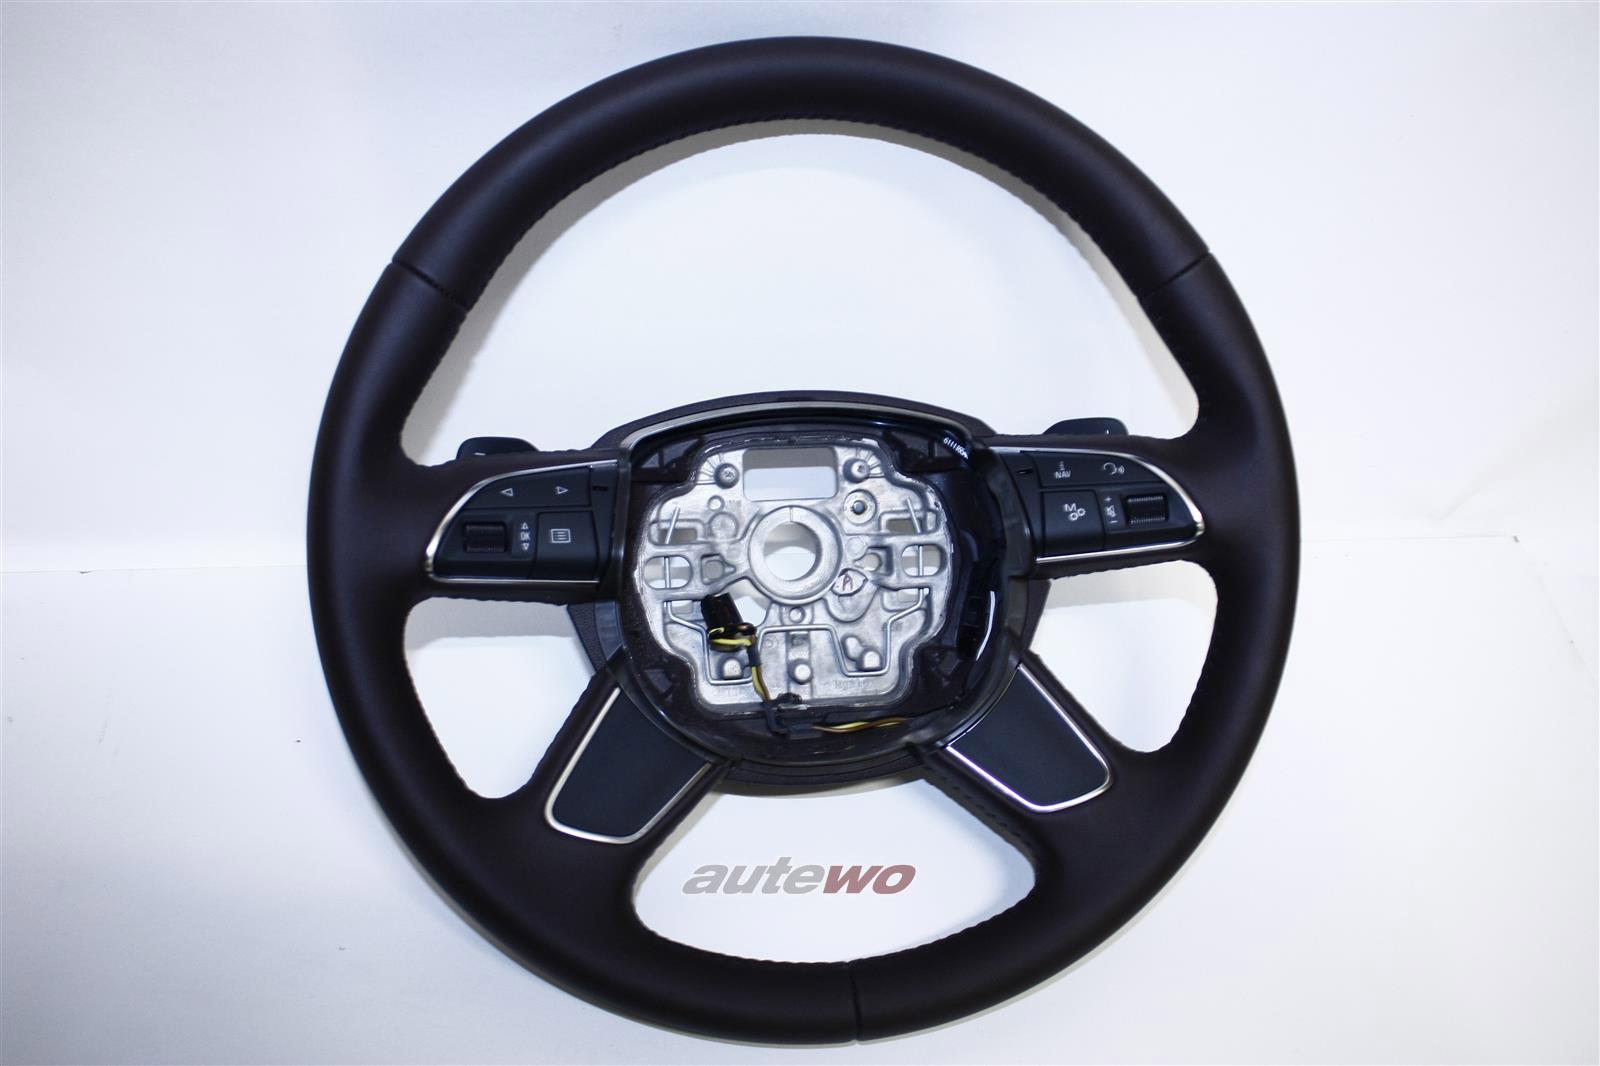 4H0419091B NEU Audi A8 D4 Leder-Lenkrad beheizbar DE8 mokkabraun